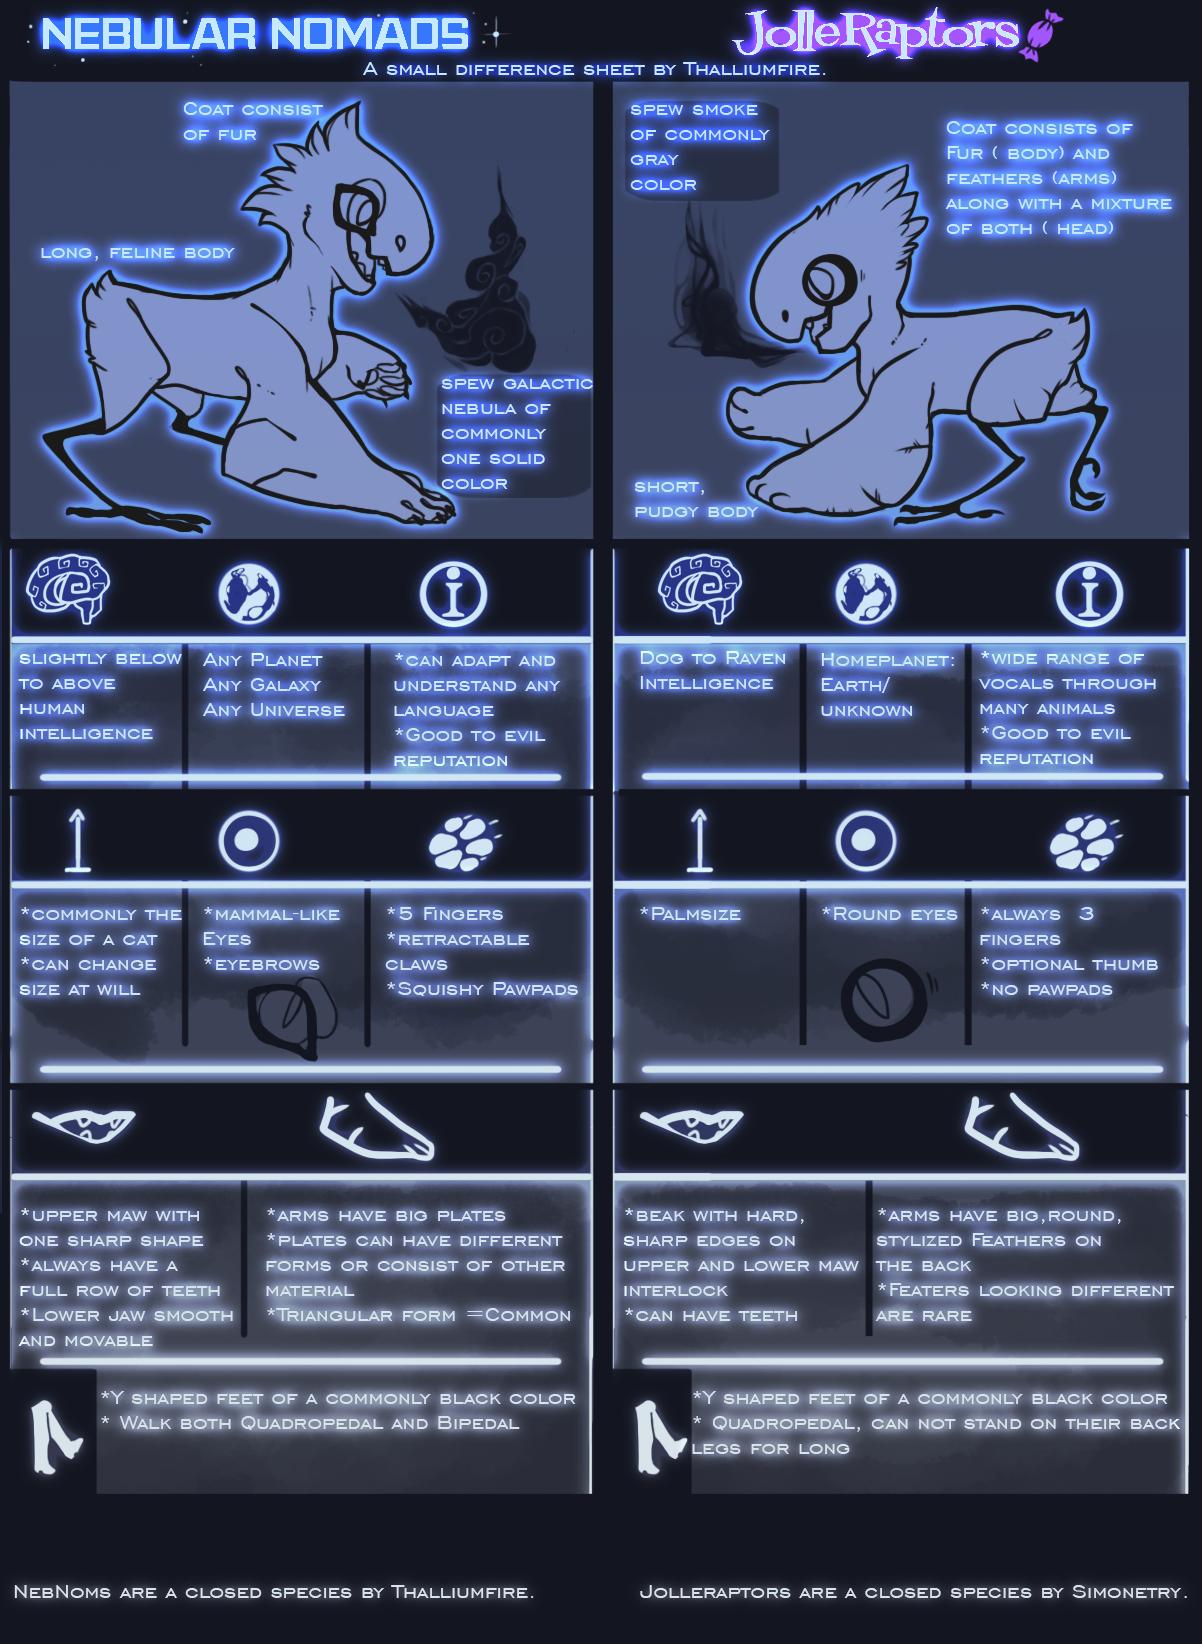 Infosheet: NebNom and JR differences by Thalliumfire